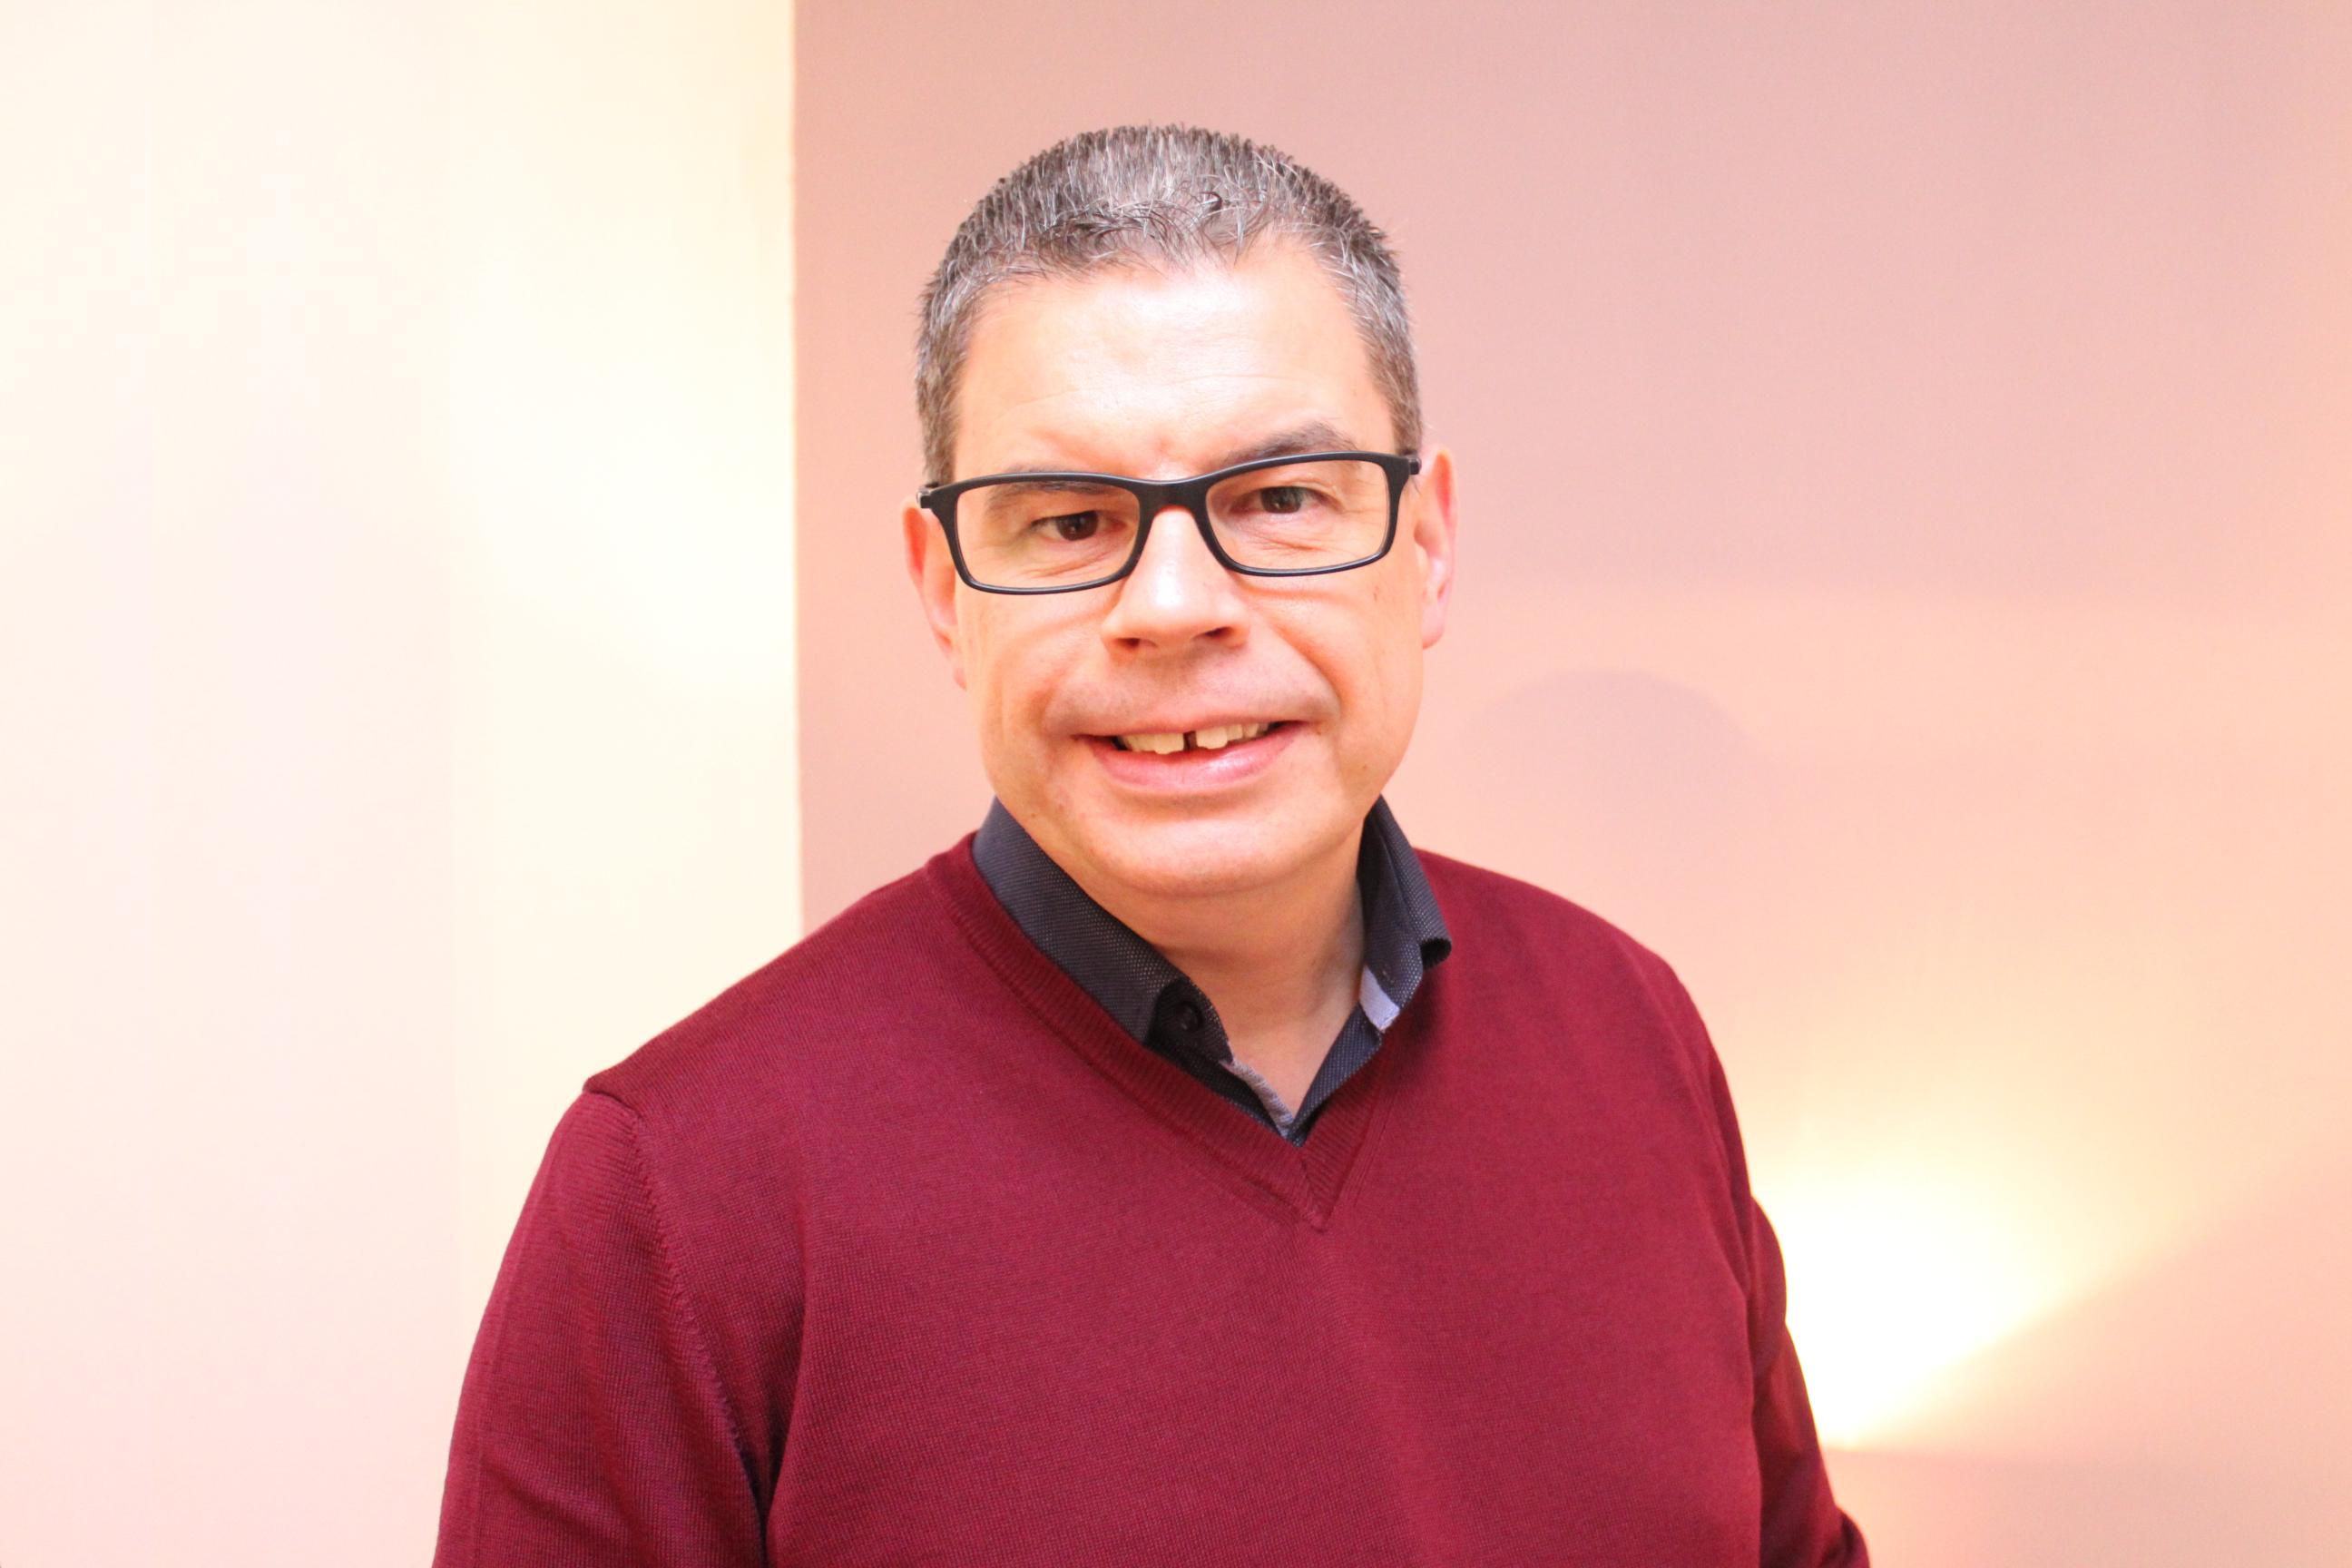 Foto van Mickel Reemer, als senior technisch consultant bij ChipSoft en werkzaam in Team Datawarehouse